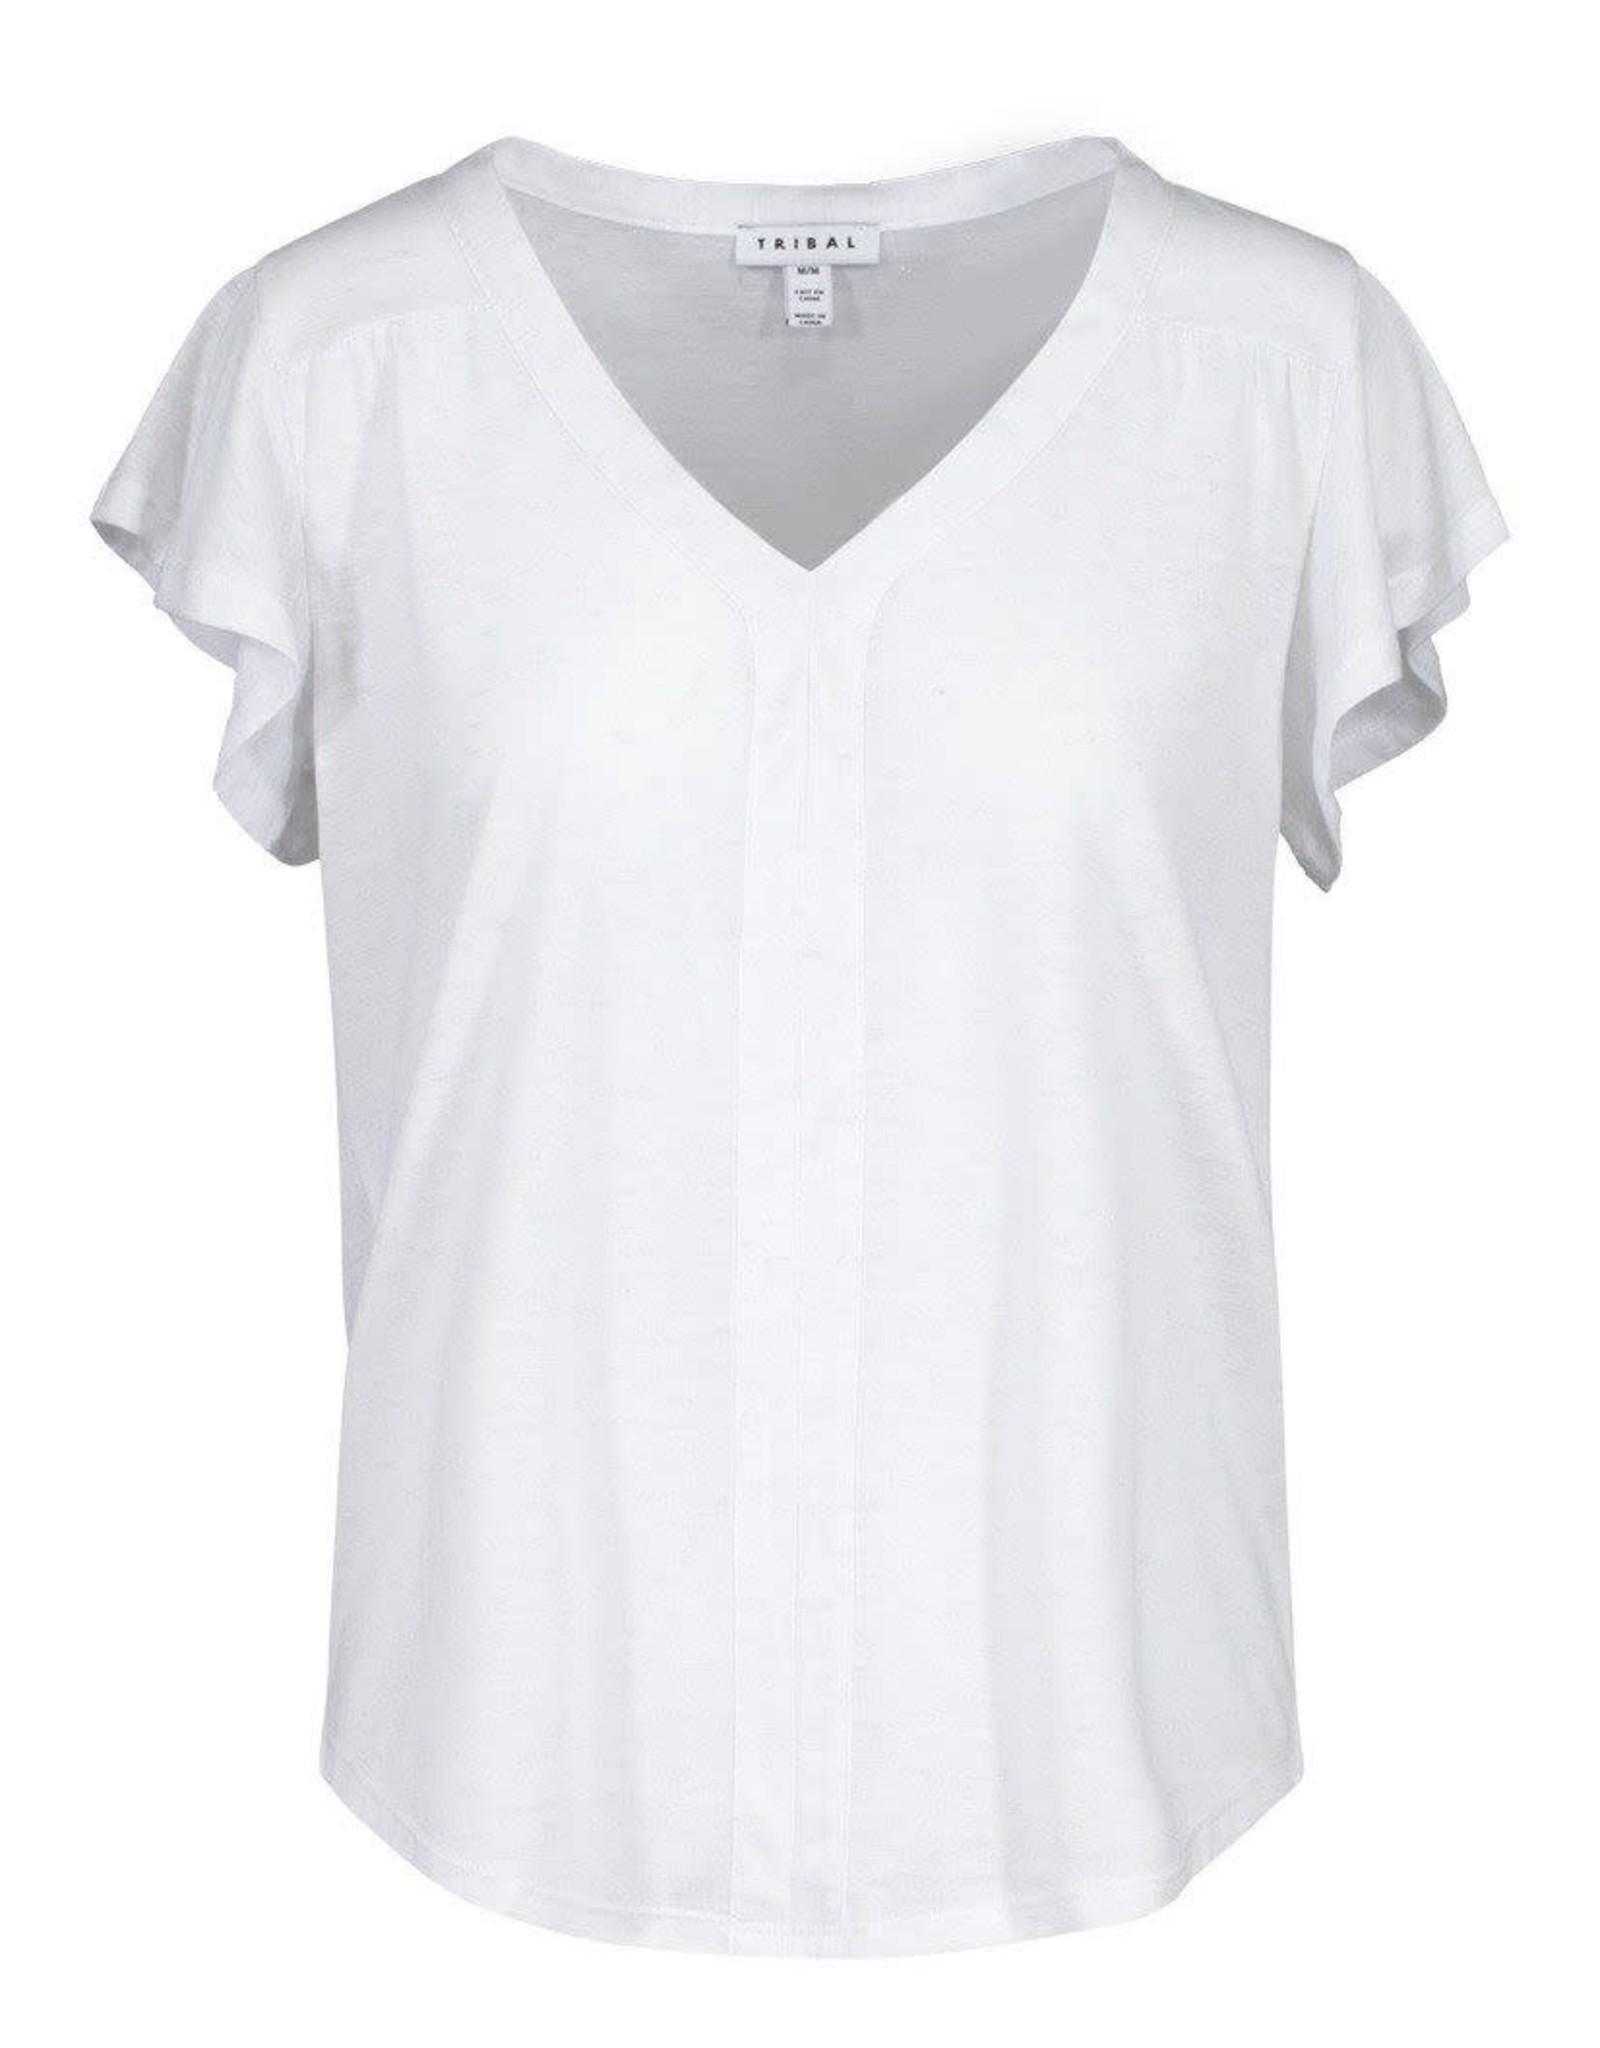 Tribal White Tinsel Ruffle Sleeve V Neck Short Sleeve Top